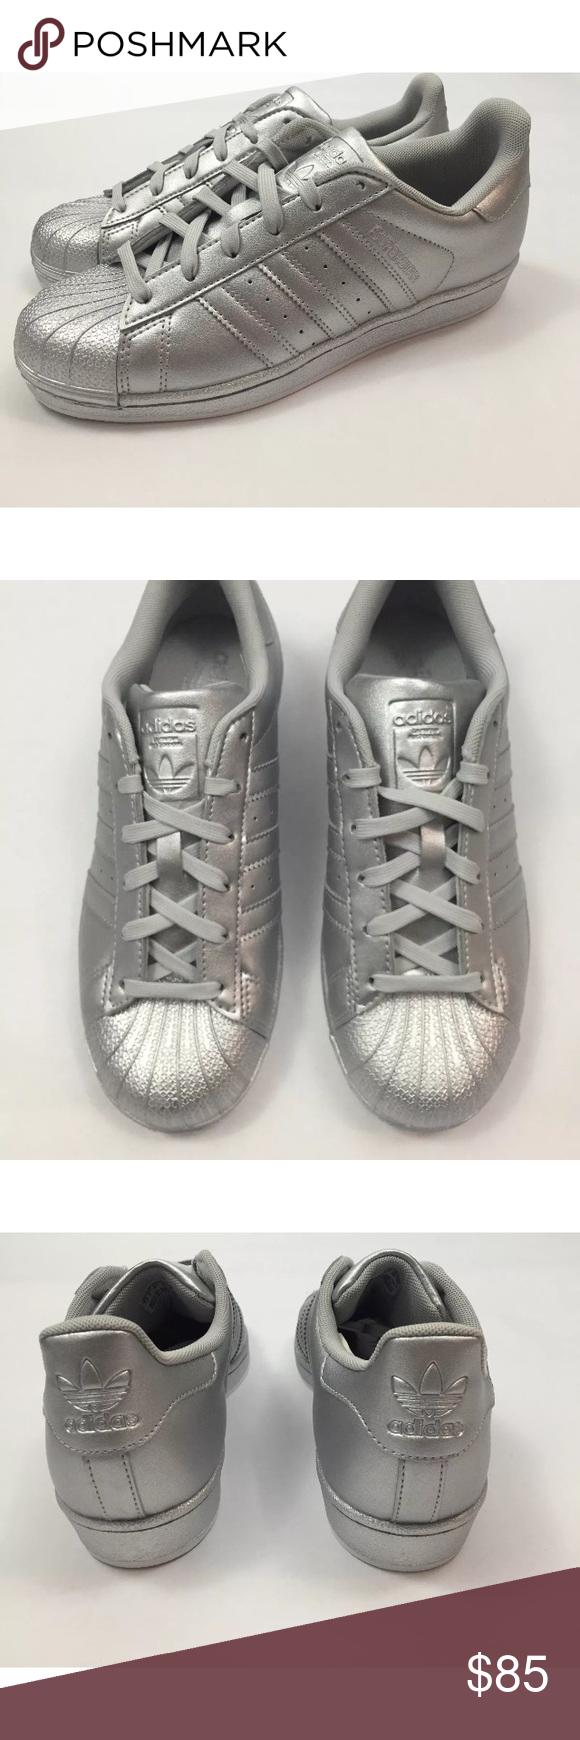 Adidas superstar silver metallic shell